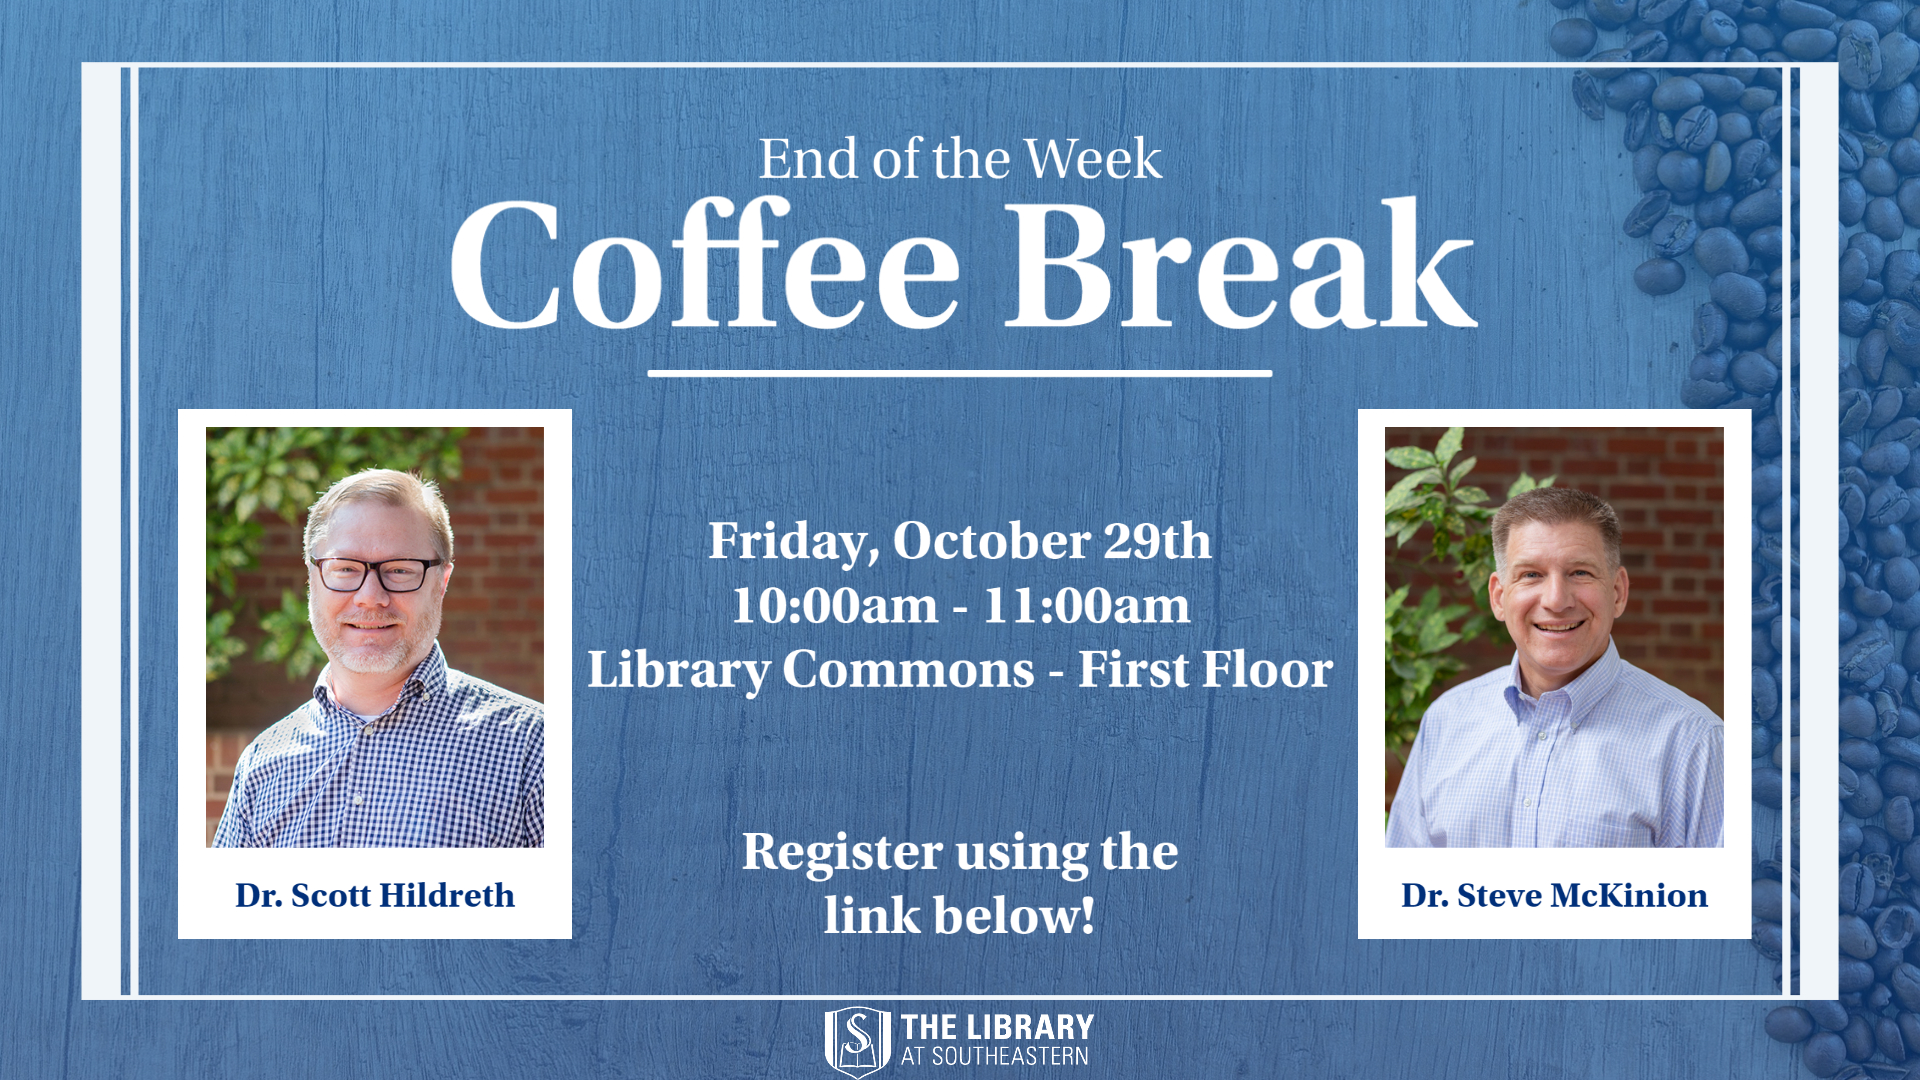 Coffee Break with Dr. Scott Hildreth & Dr. Steve McKinion